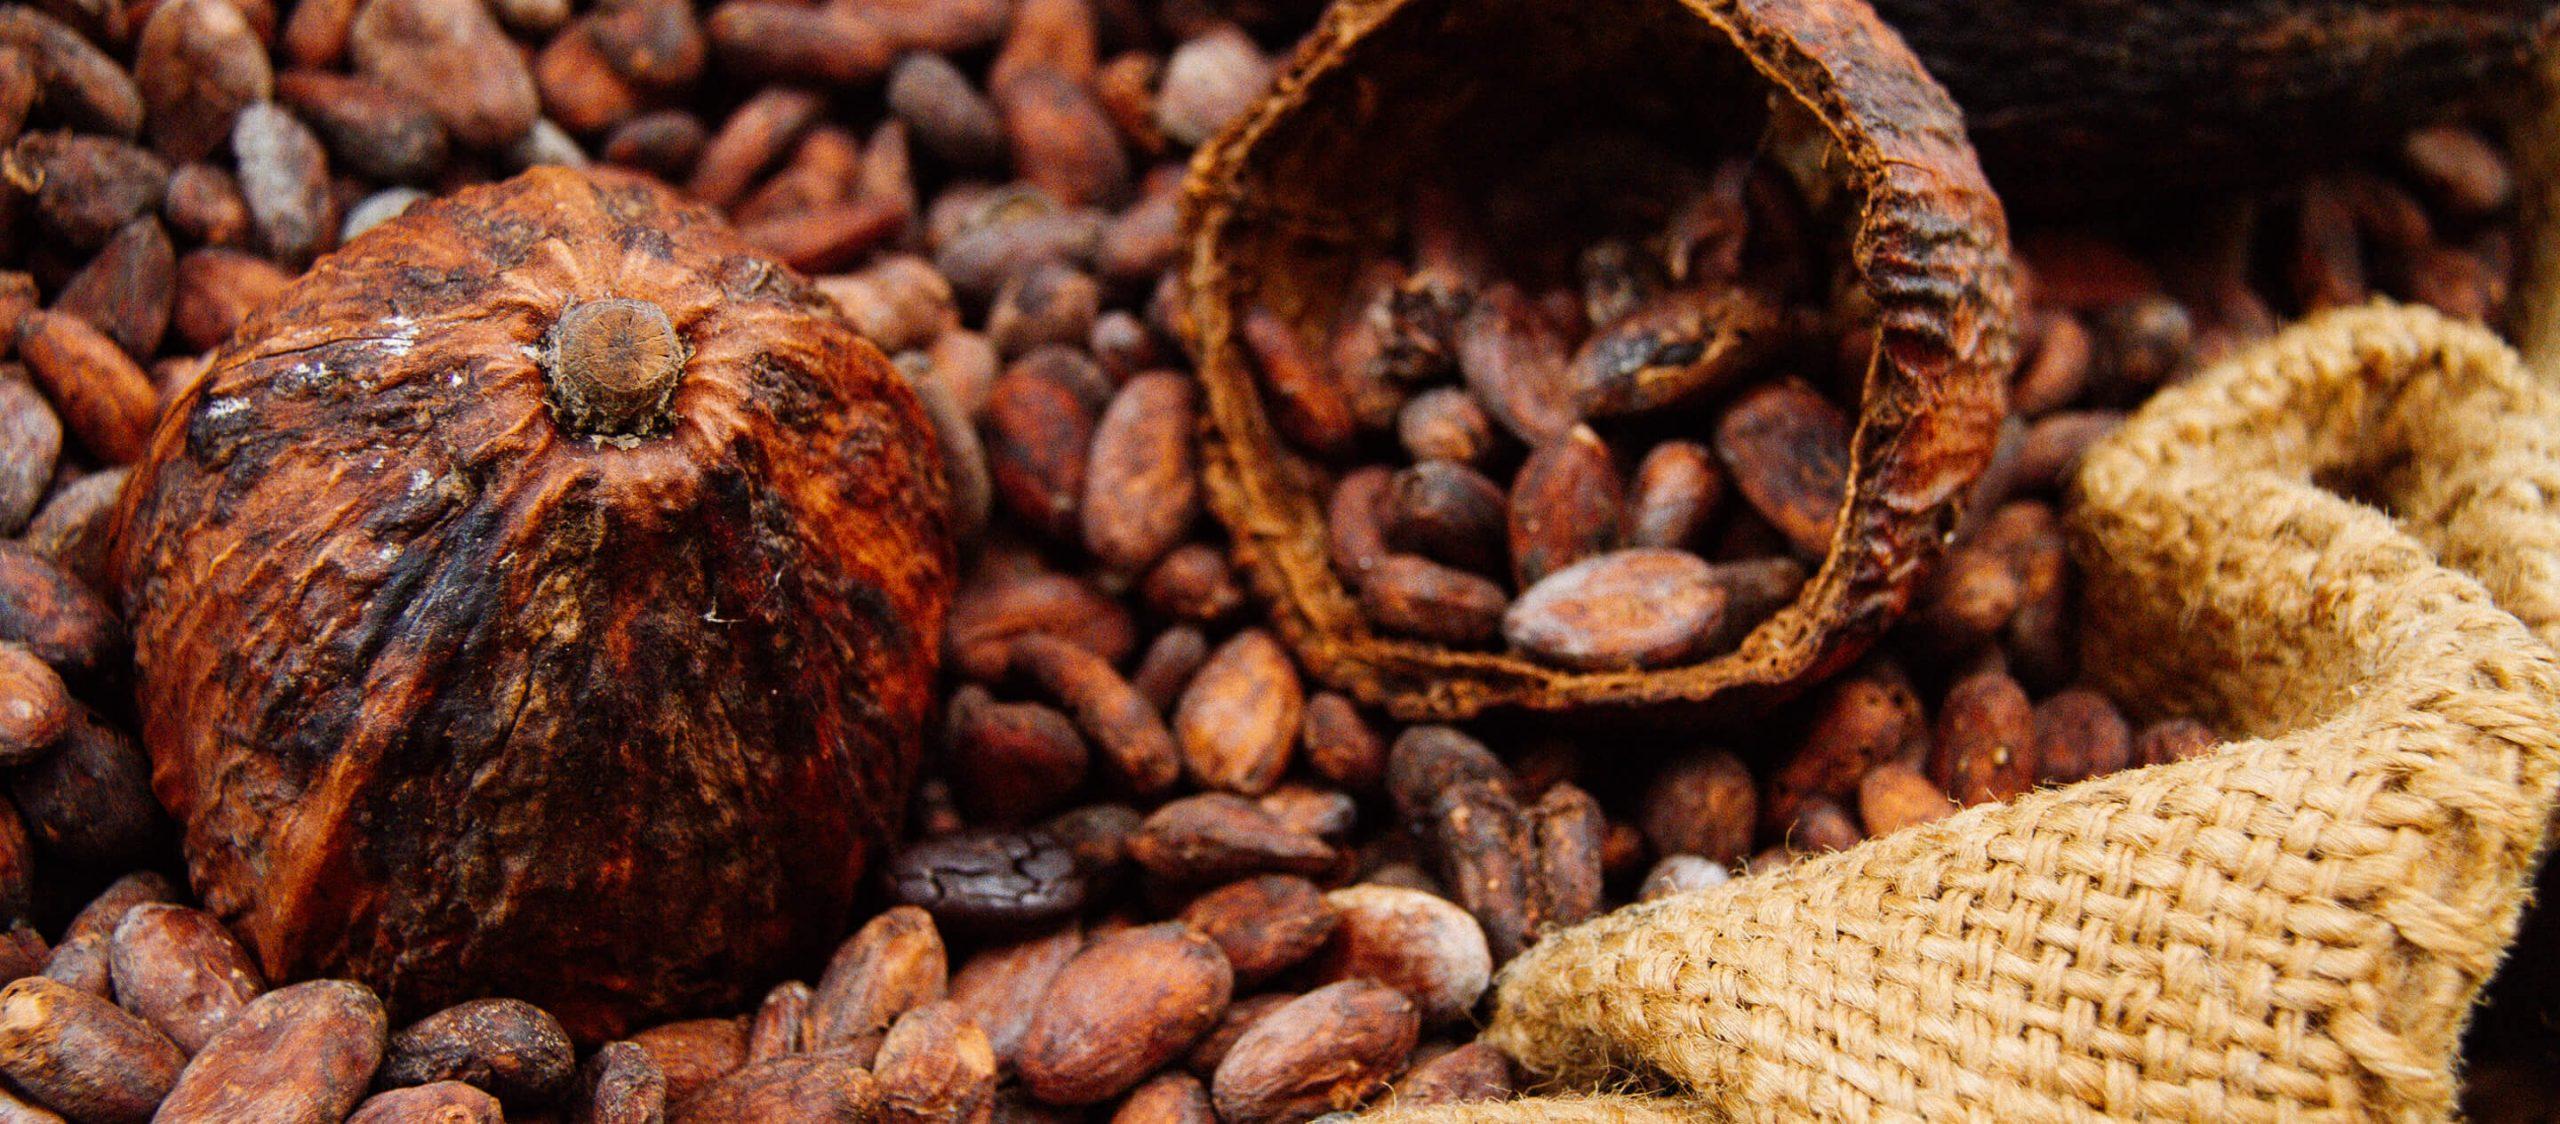 Cocoa Valley Cafe : โกโก้ร้อนท่ามกลางหมอกฝนเมืองน่านนคร